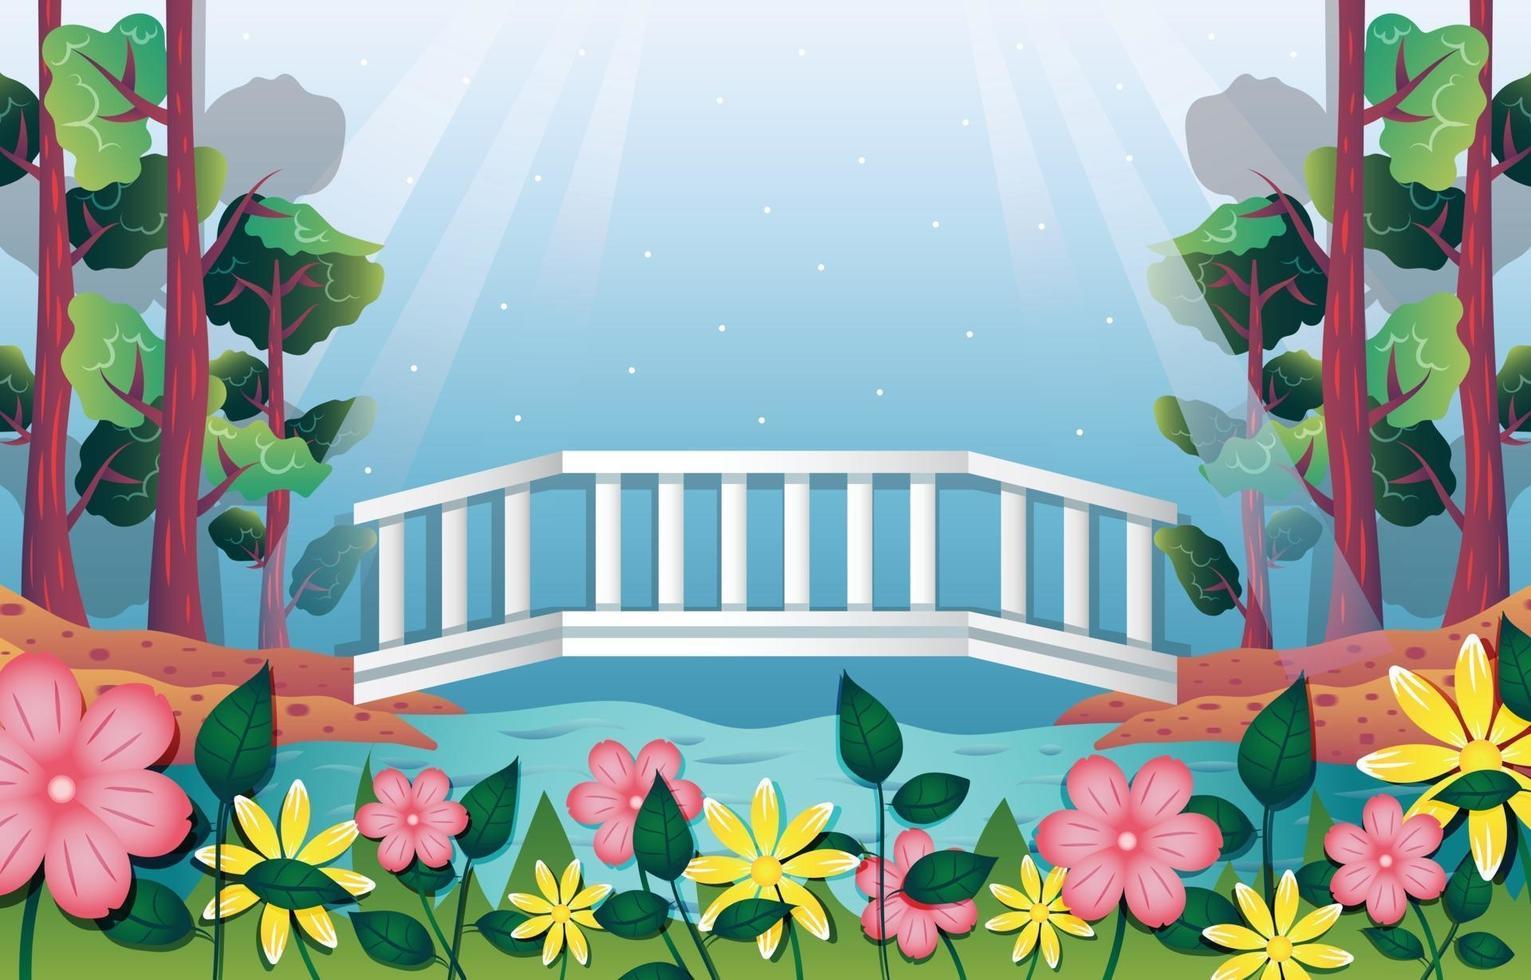 Nature Landscape with Bridge Background Template vector